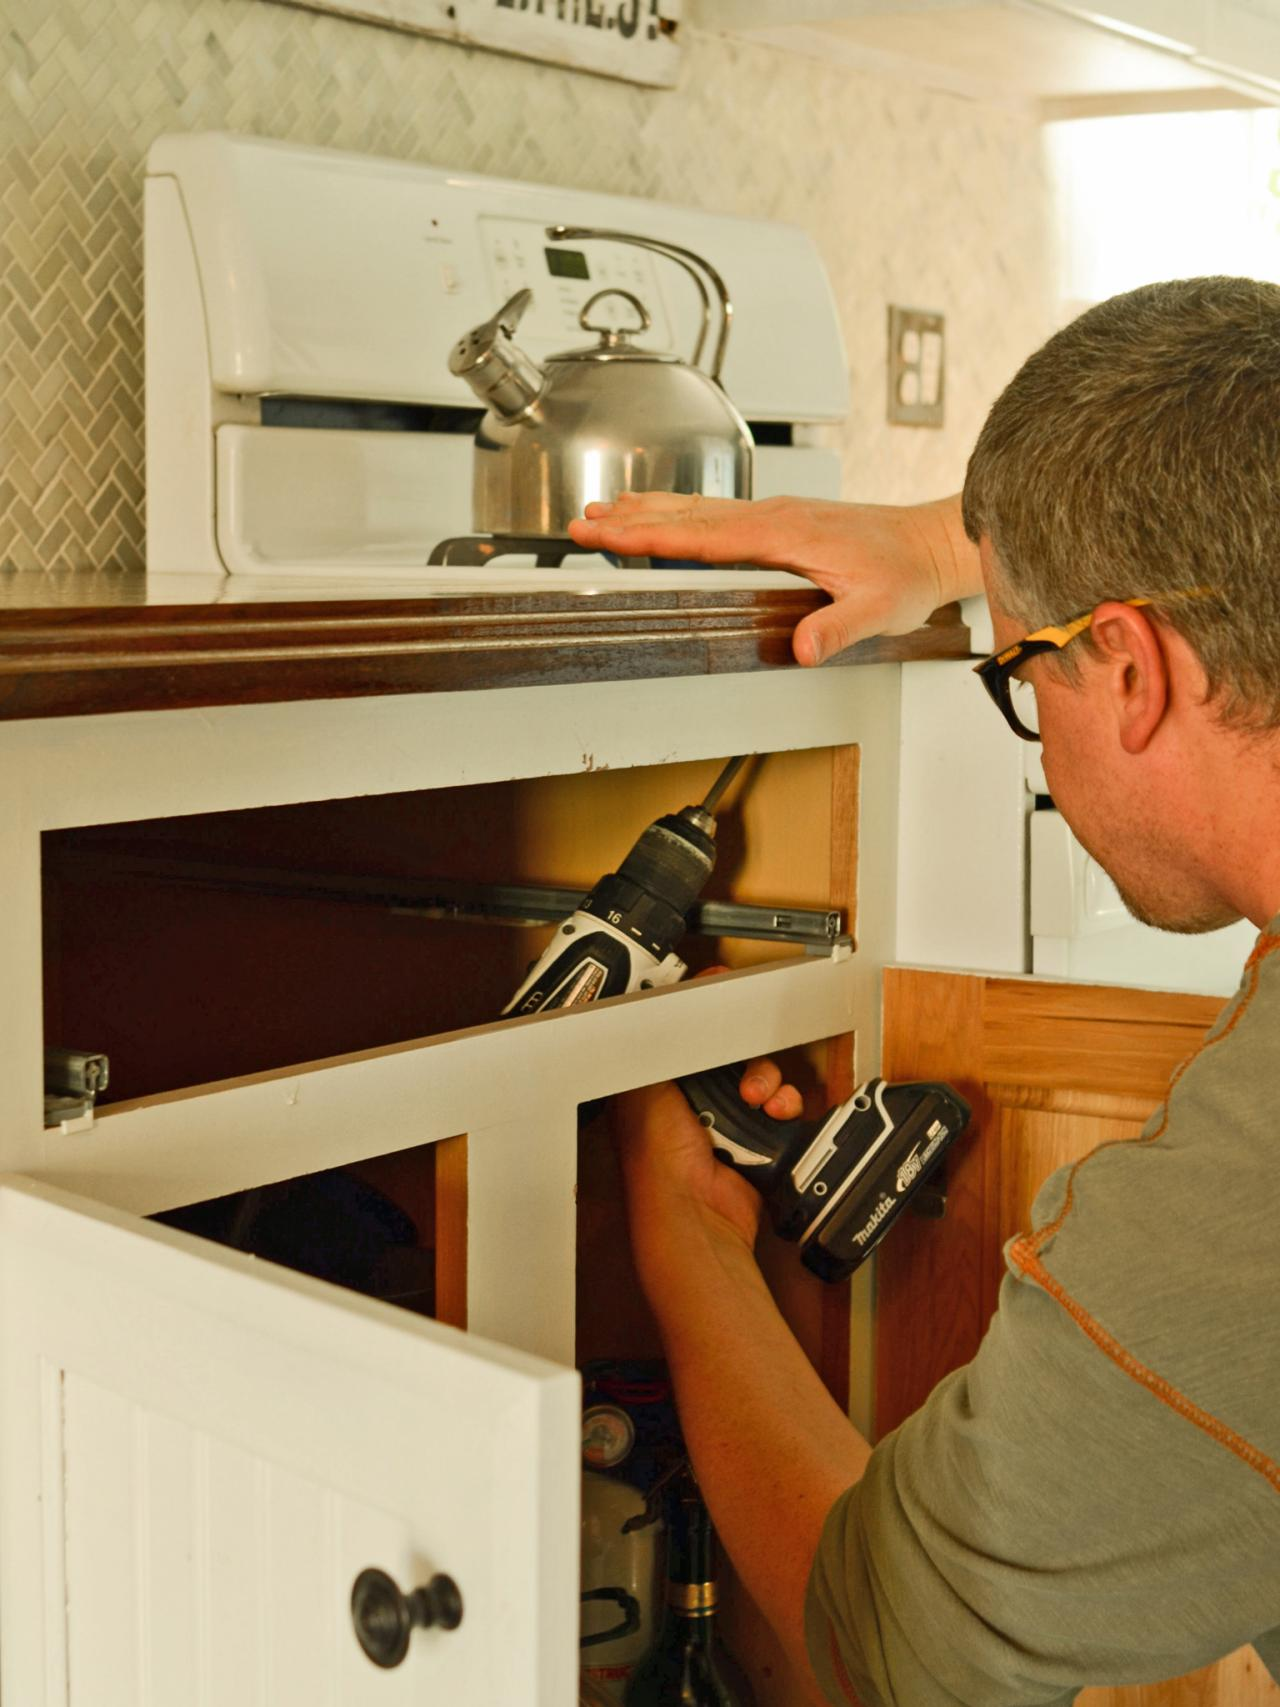 Uncategorized How To Install Kitchen Countertop do it yourself butcher block kitchen countertop hgtv install countertops